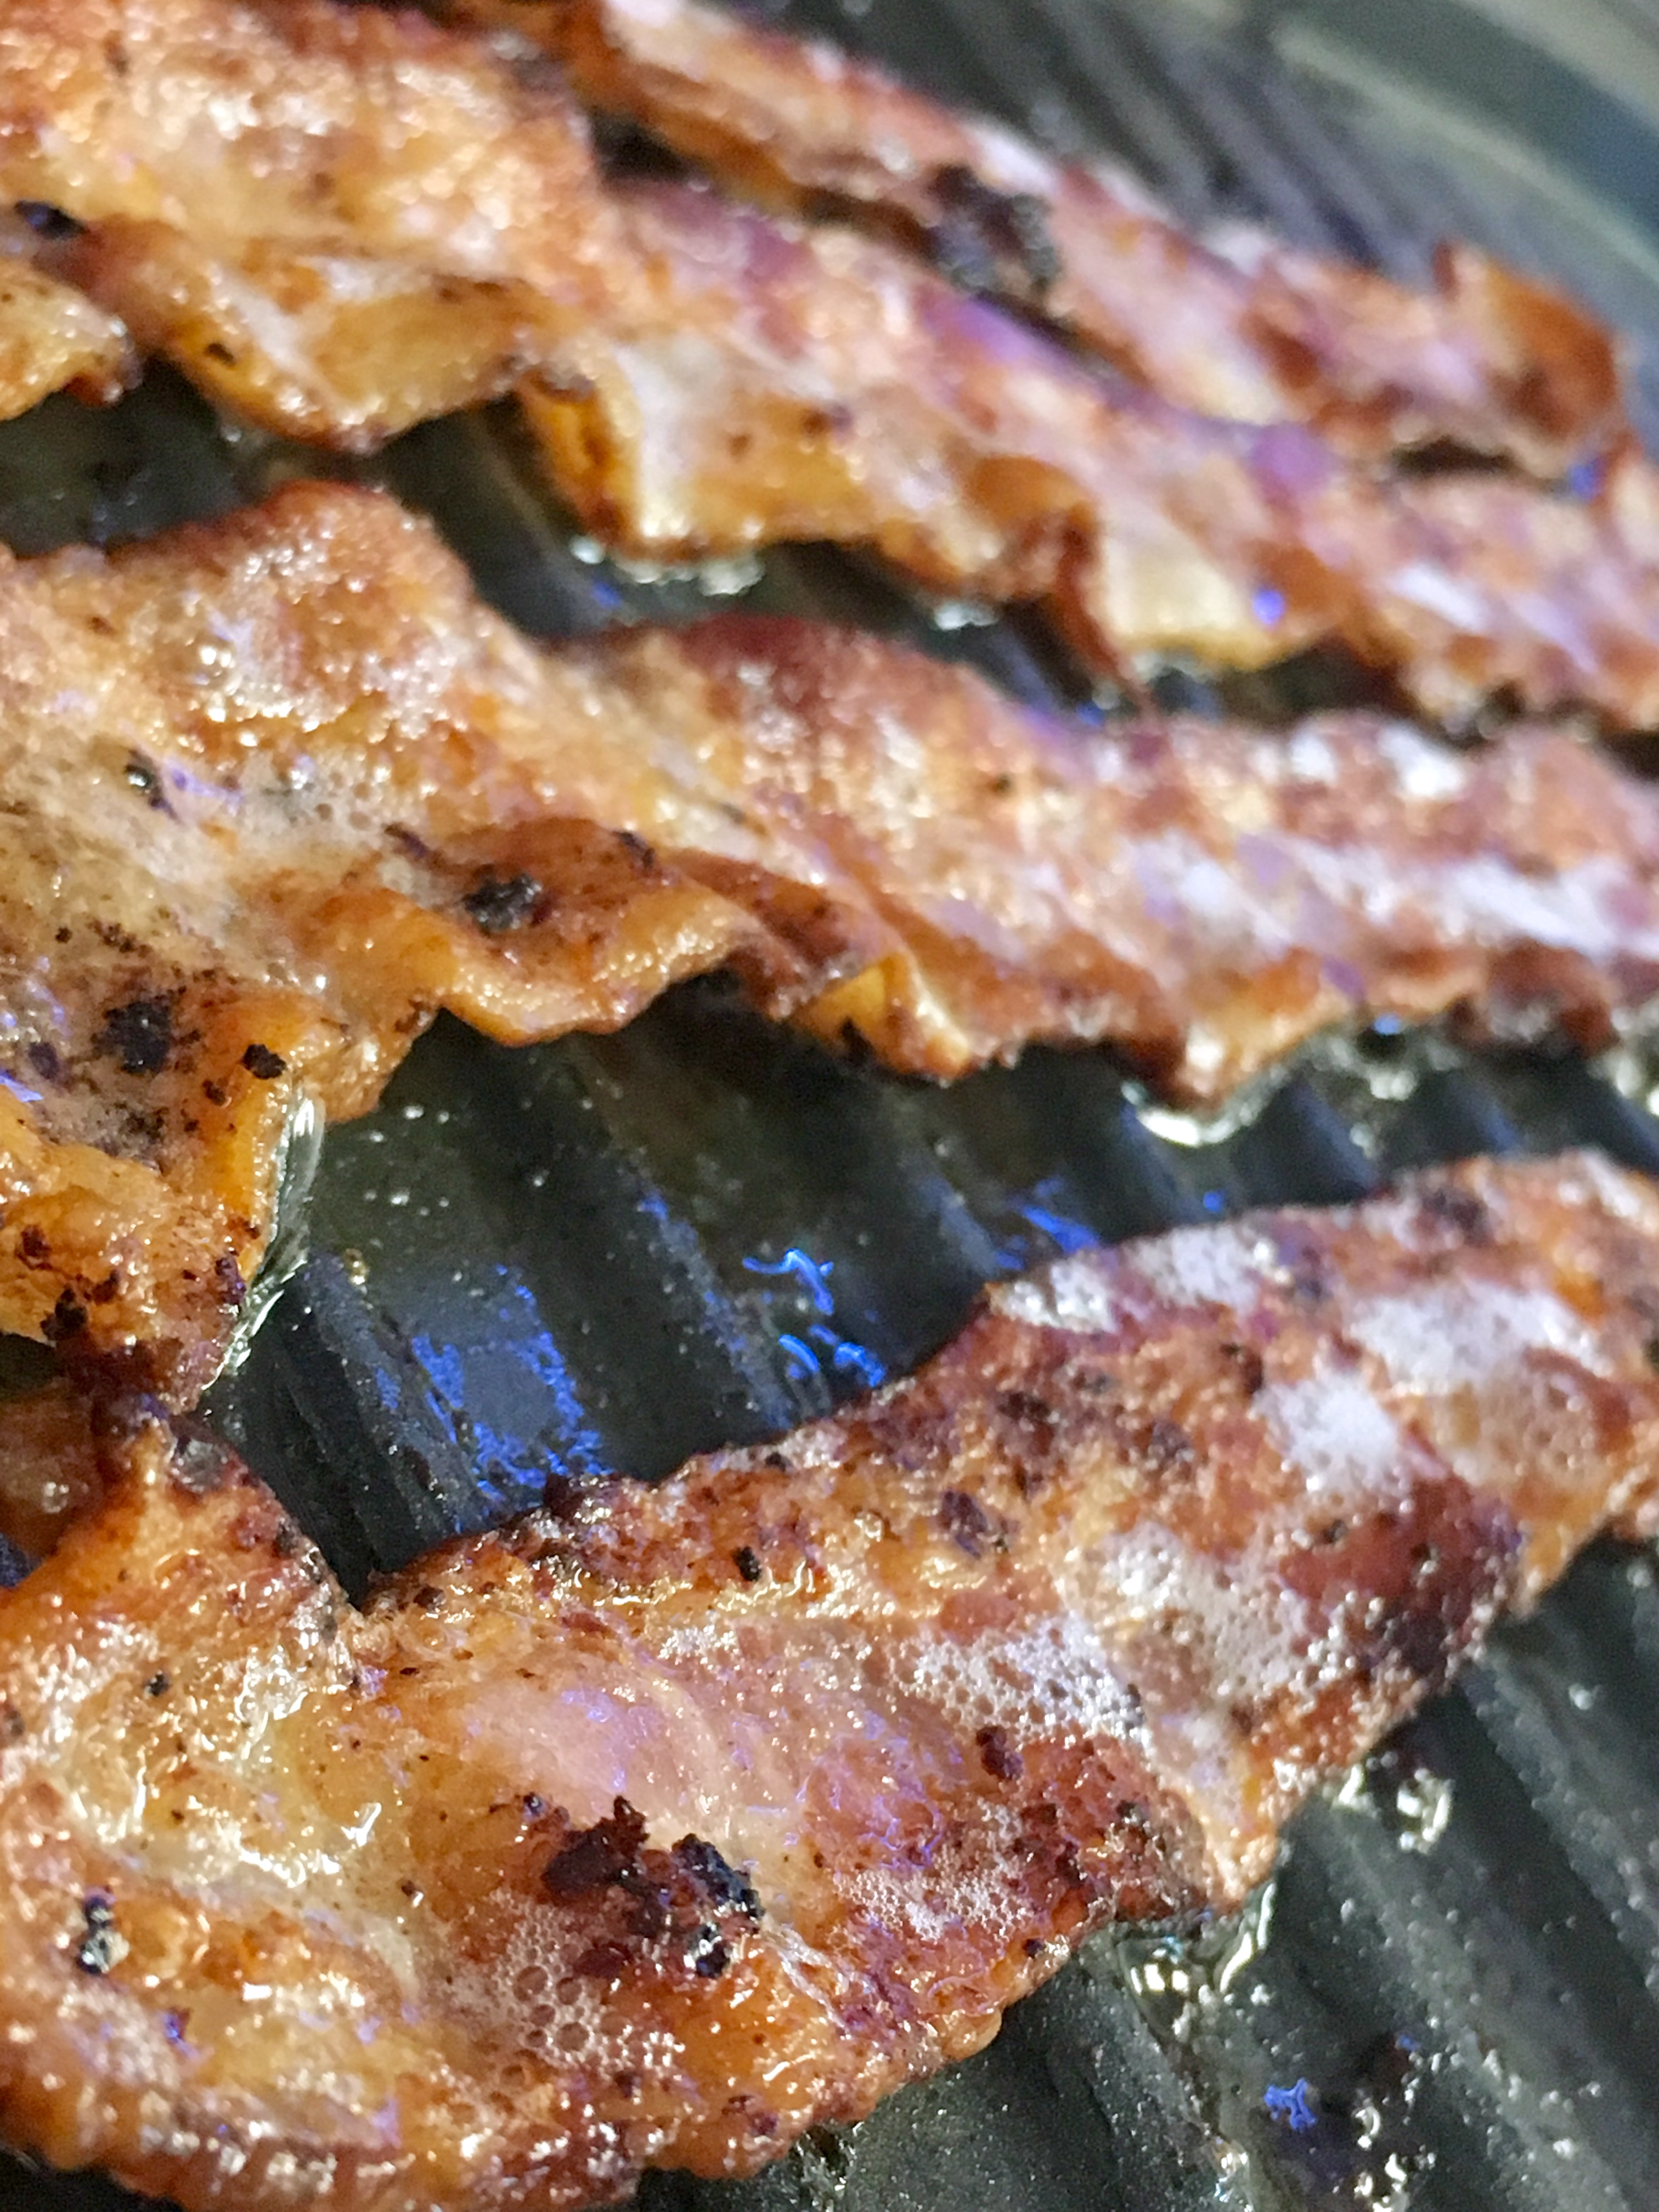 Freshly Fried Bacon